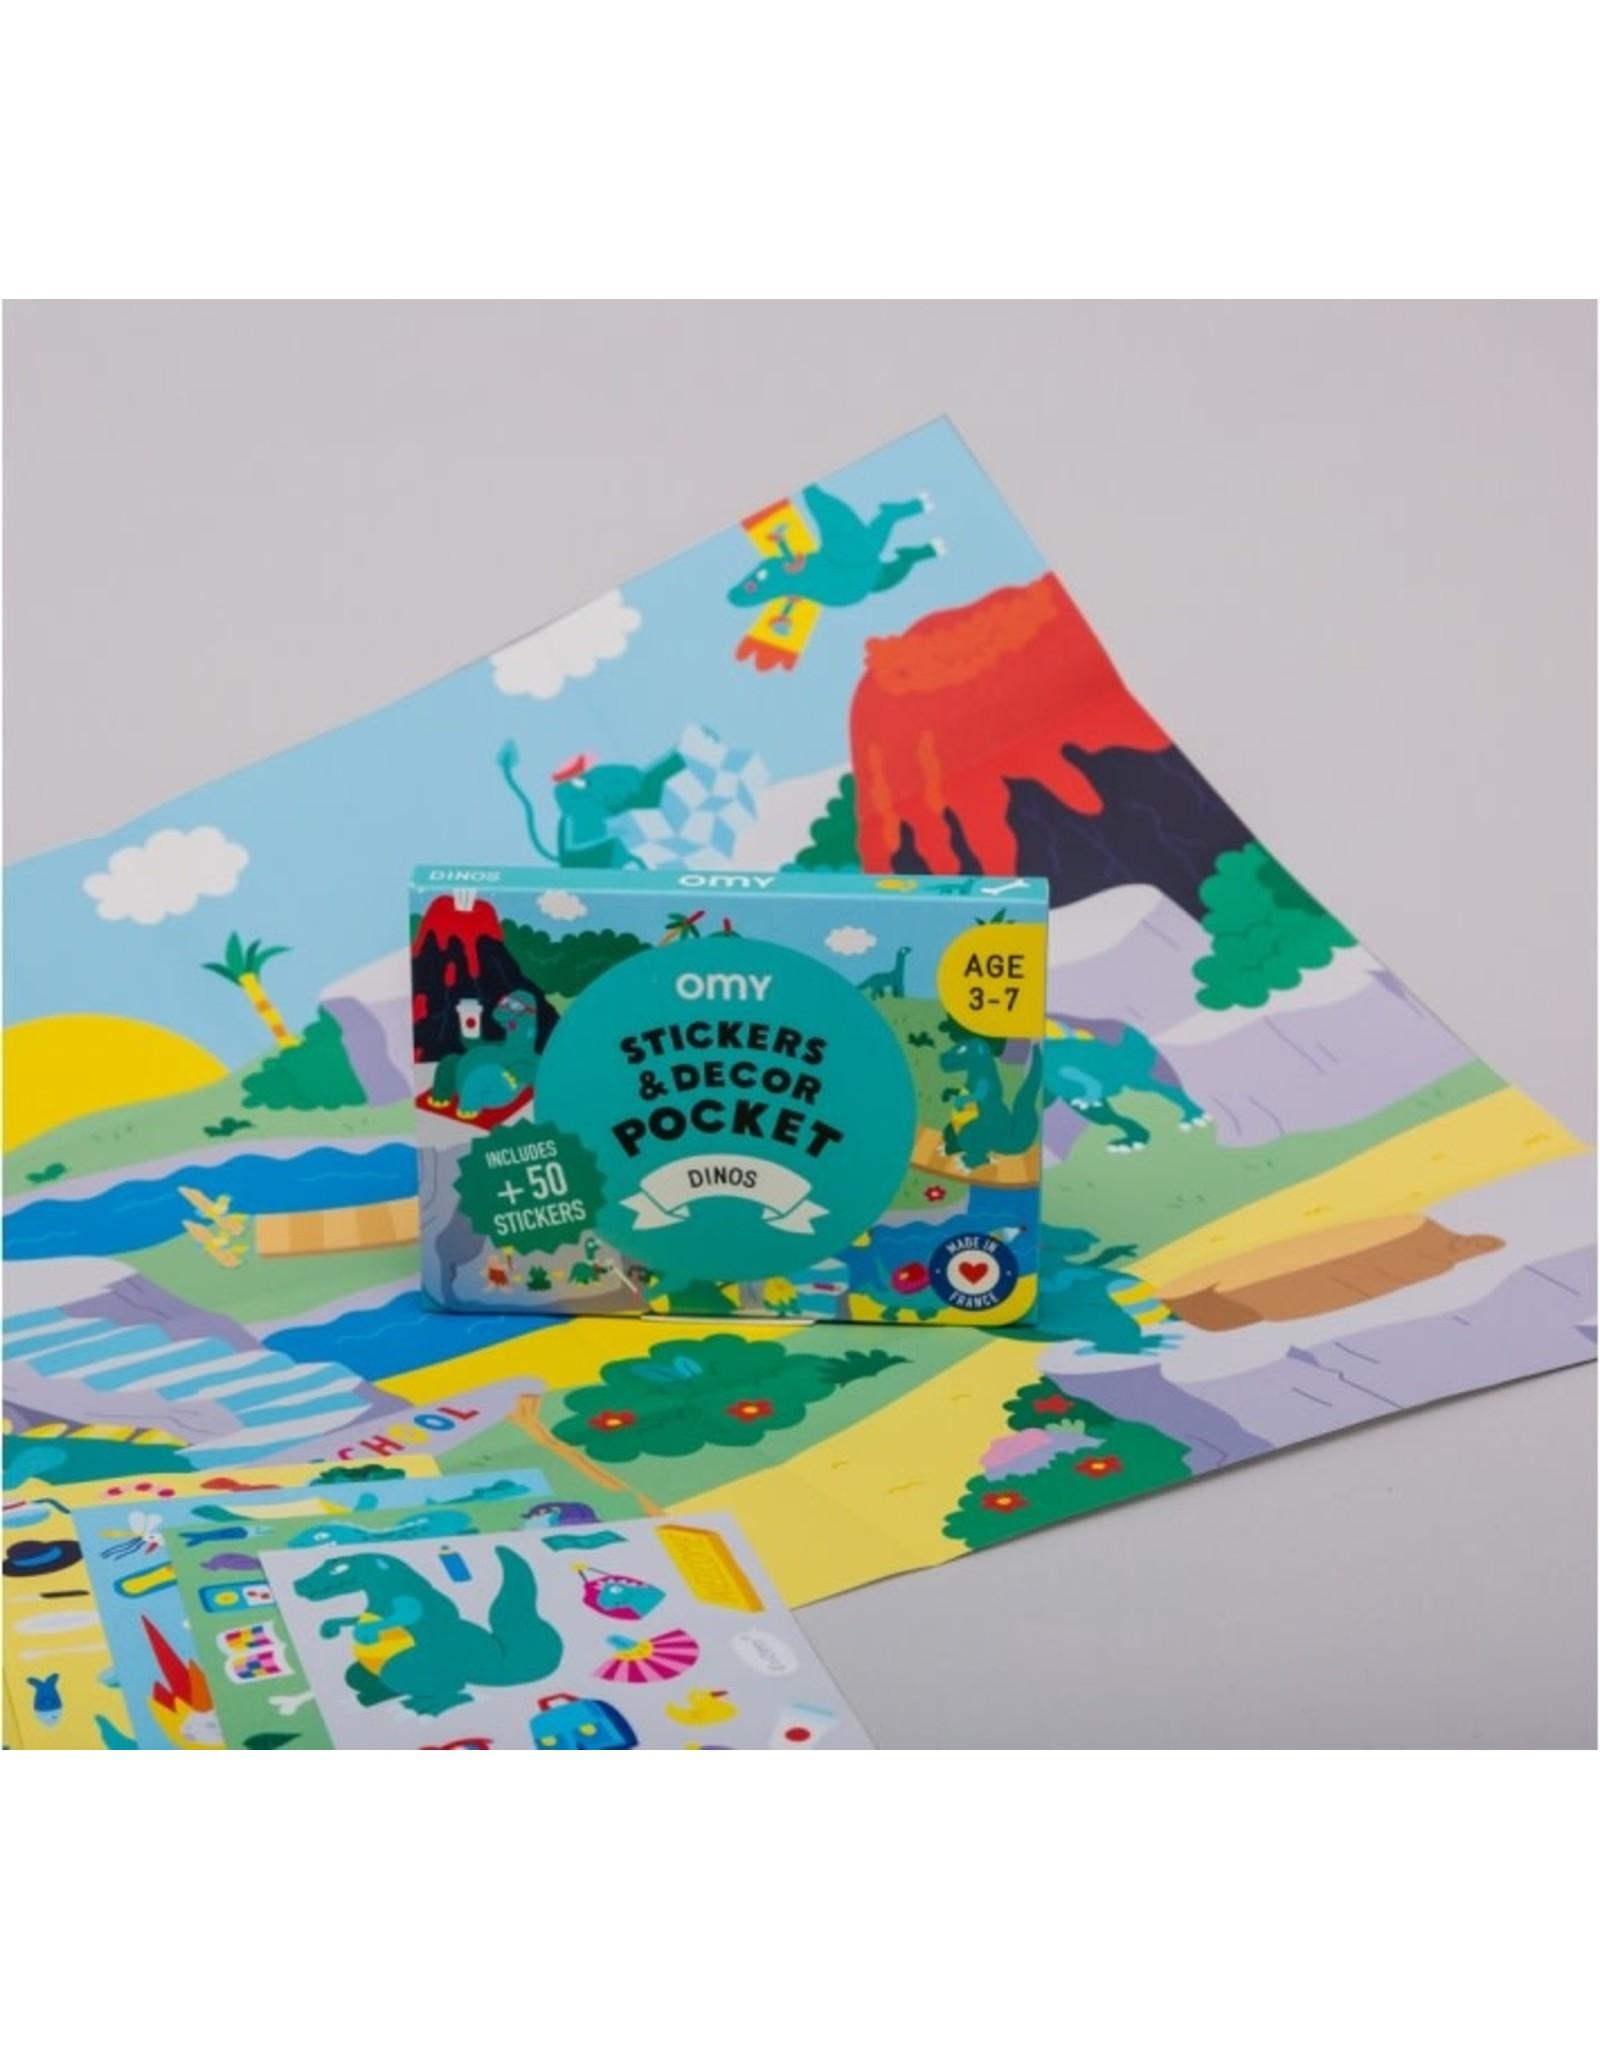 OMY Stickers decor pocket - Dinos